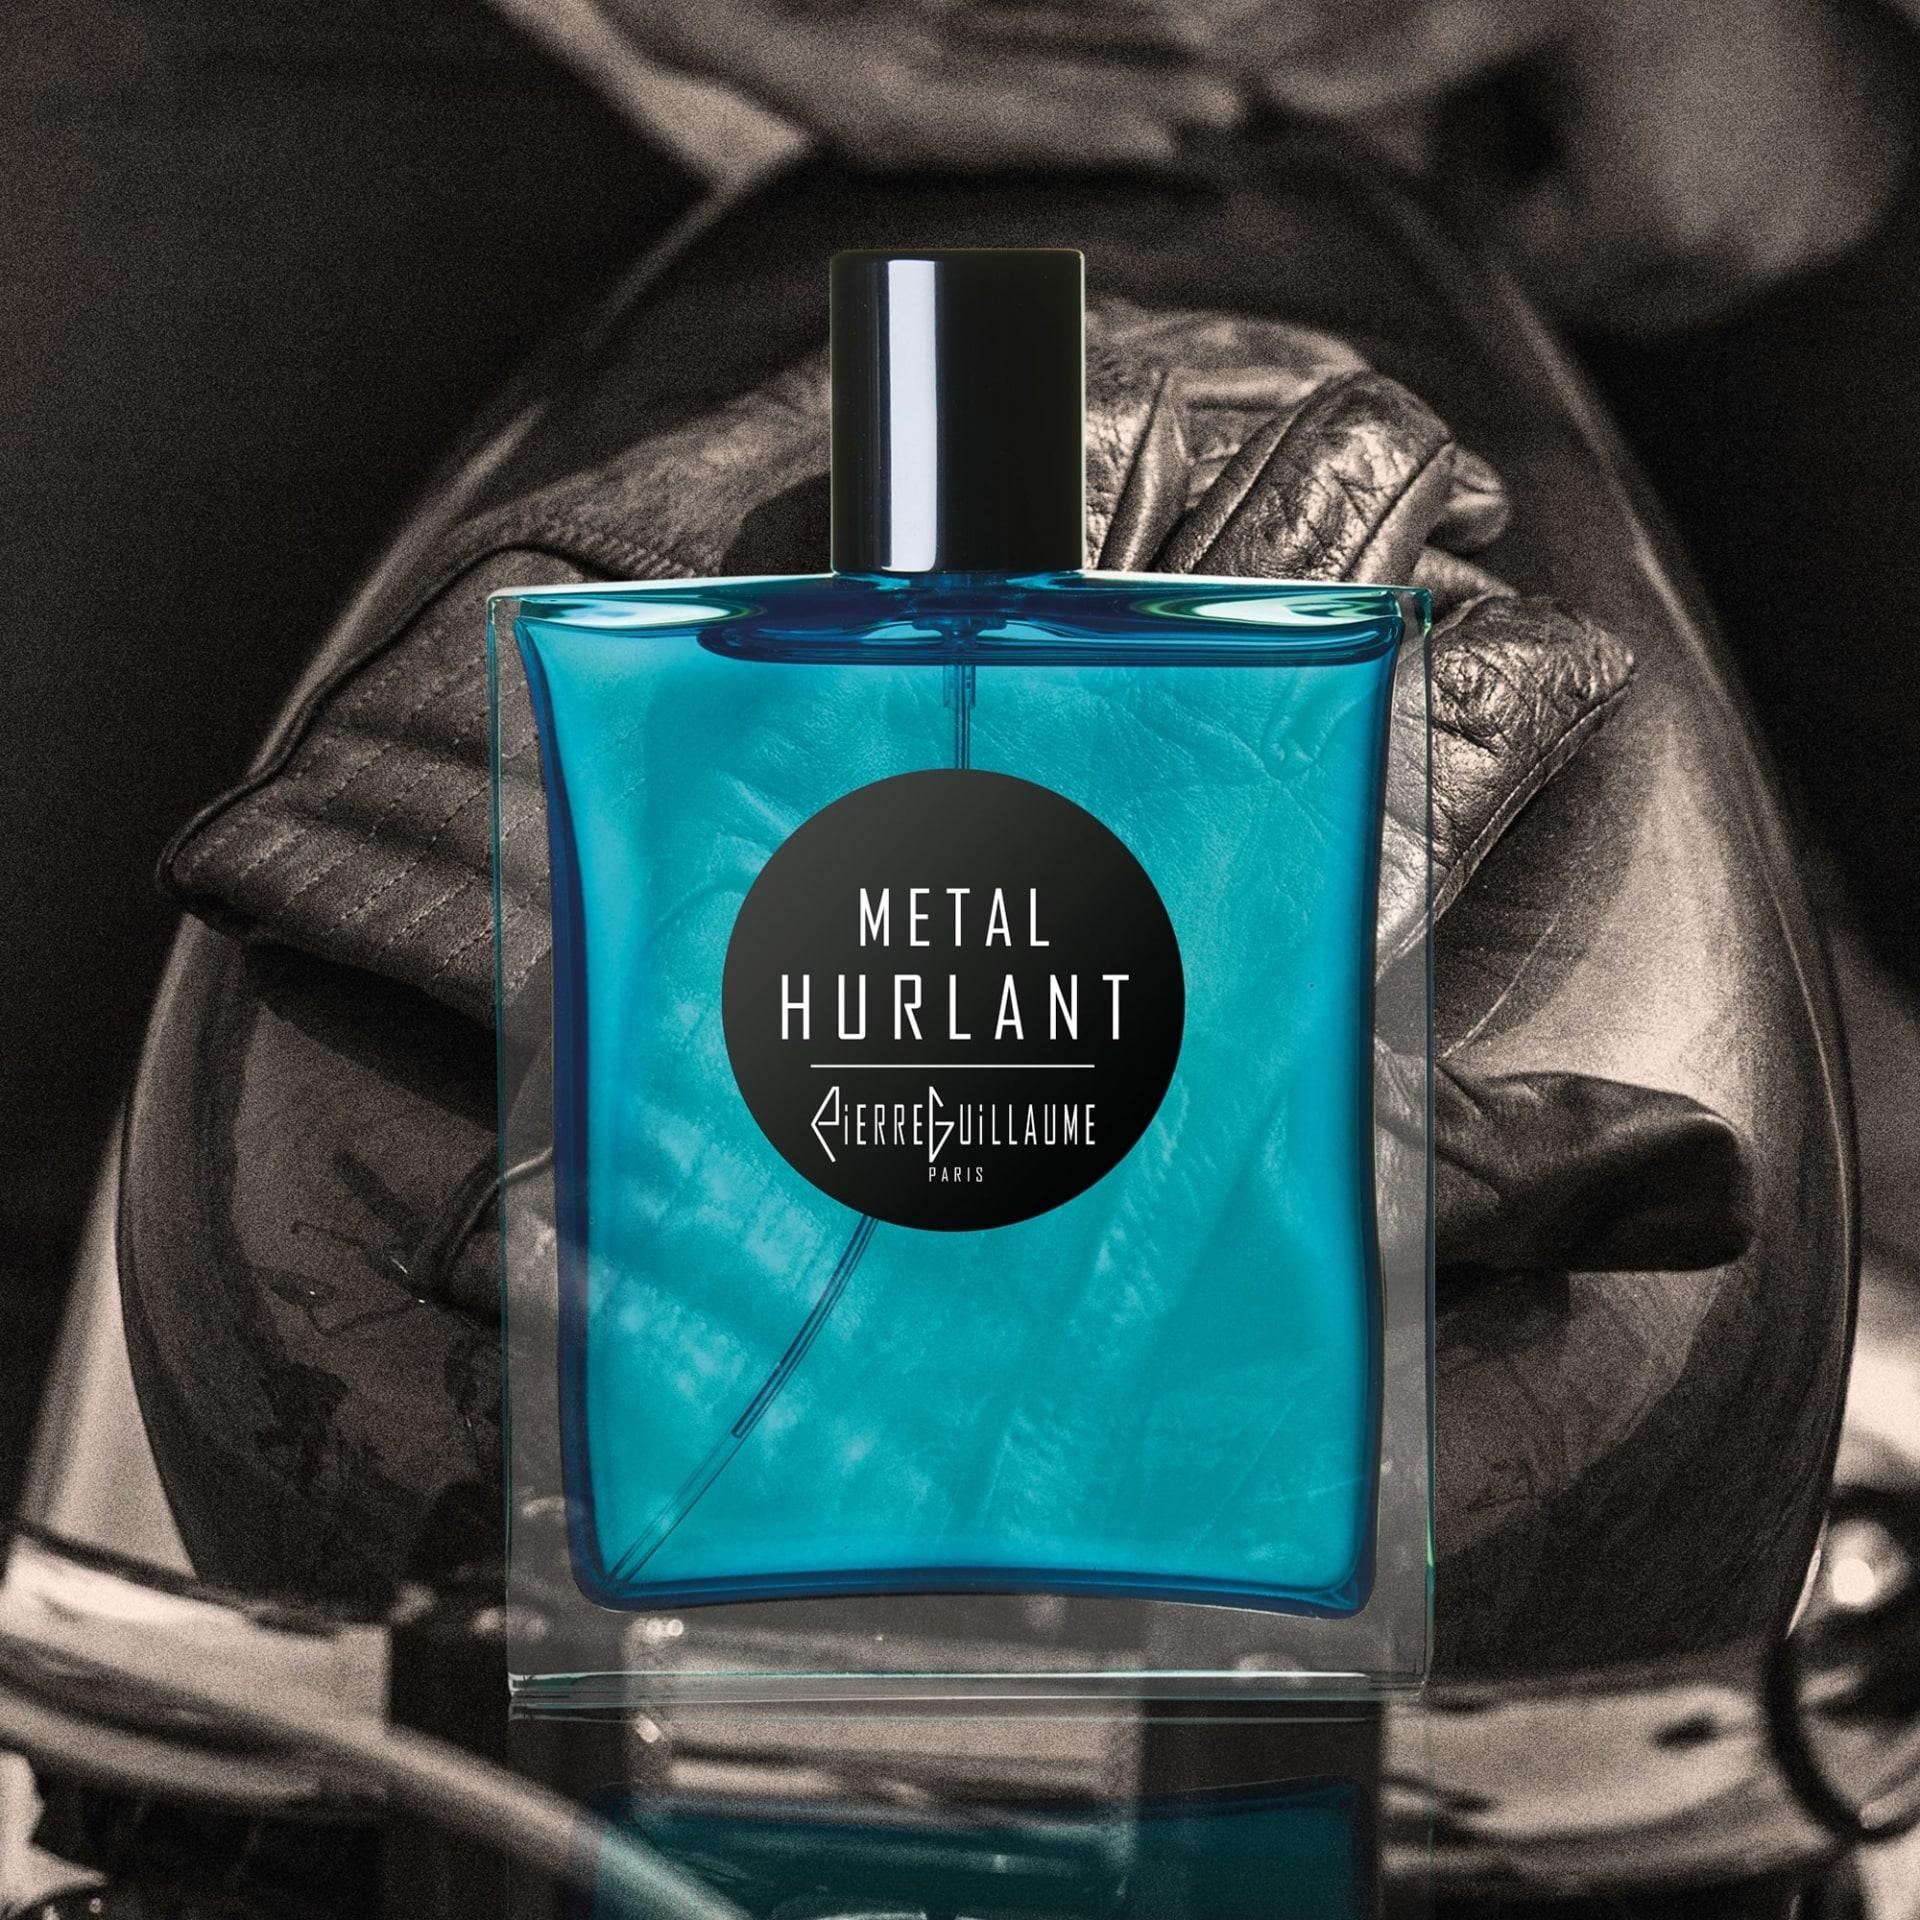 pierre-guillaume-metal-hurlant-1